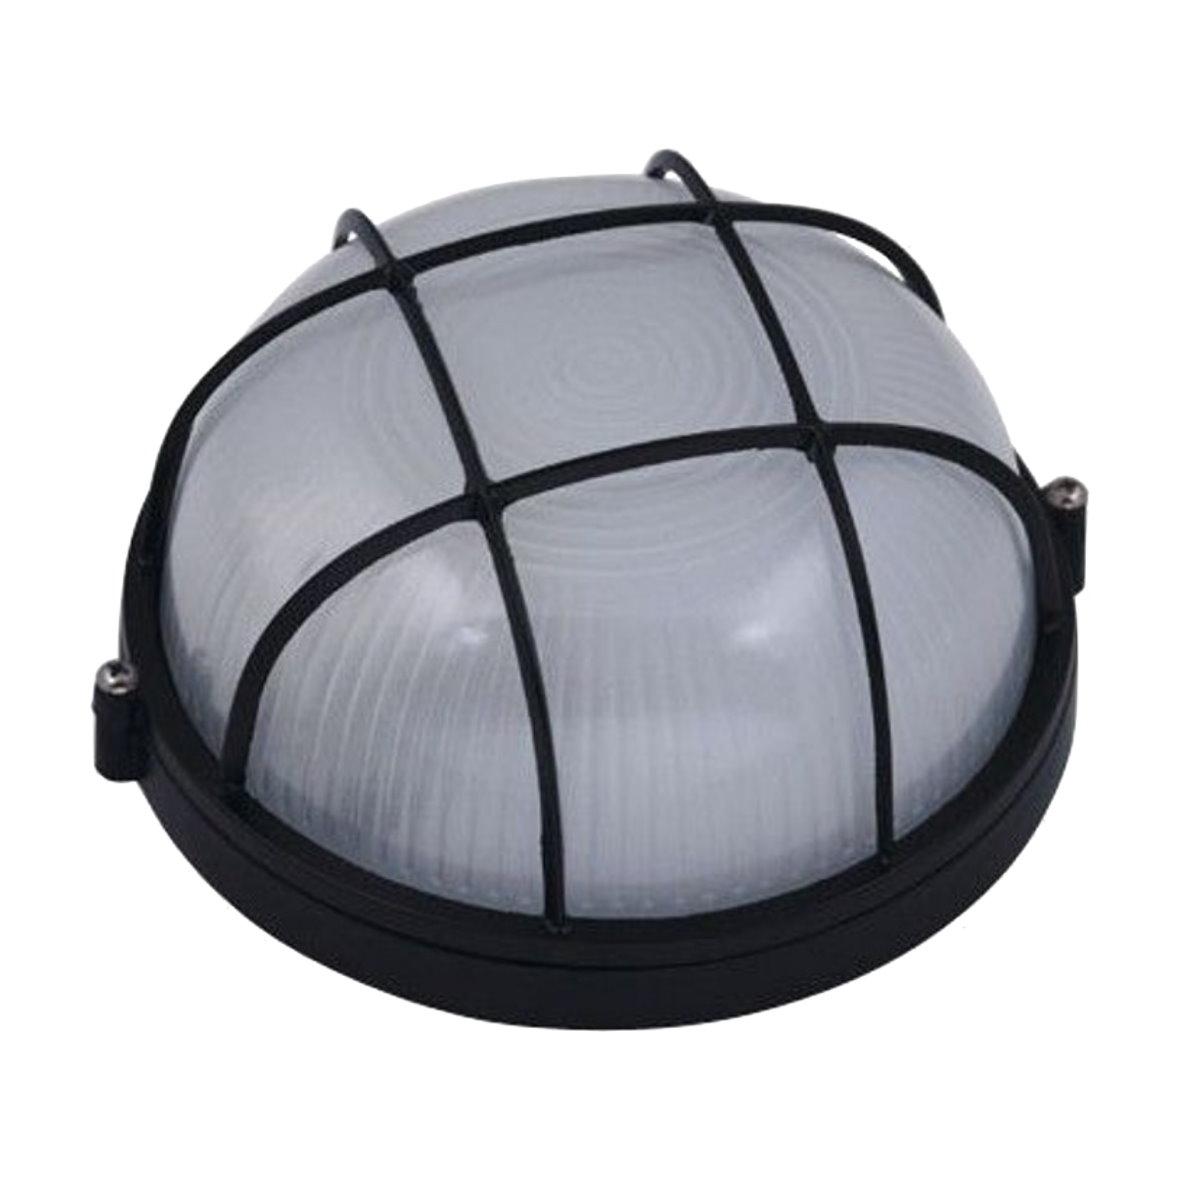 Aluminium sous sol luminaire lampe cave bulkhead ip54 cave for Luminaire exterieur sol